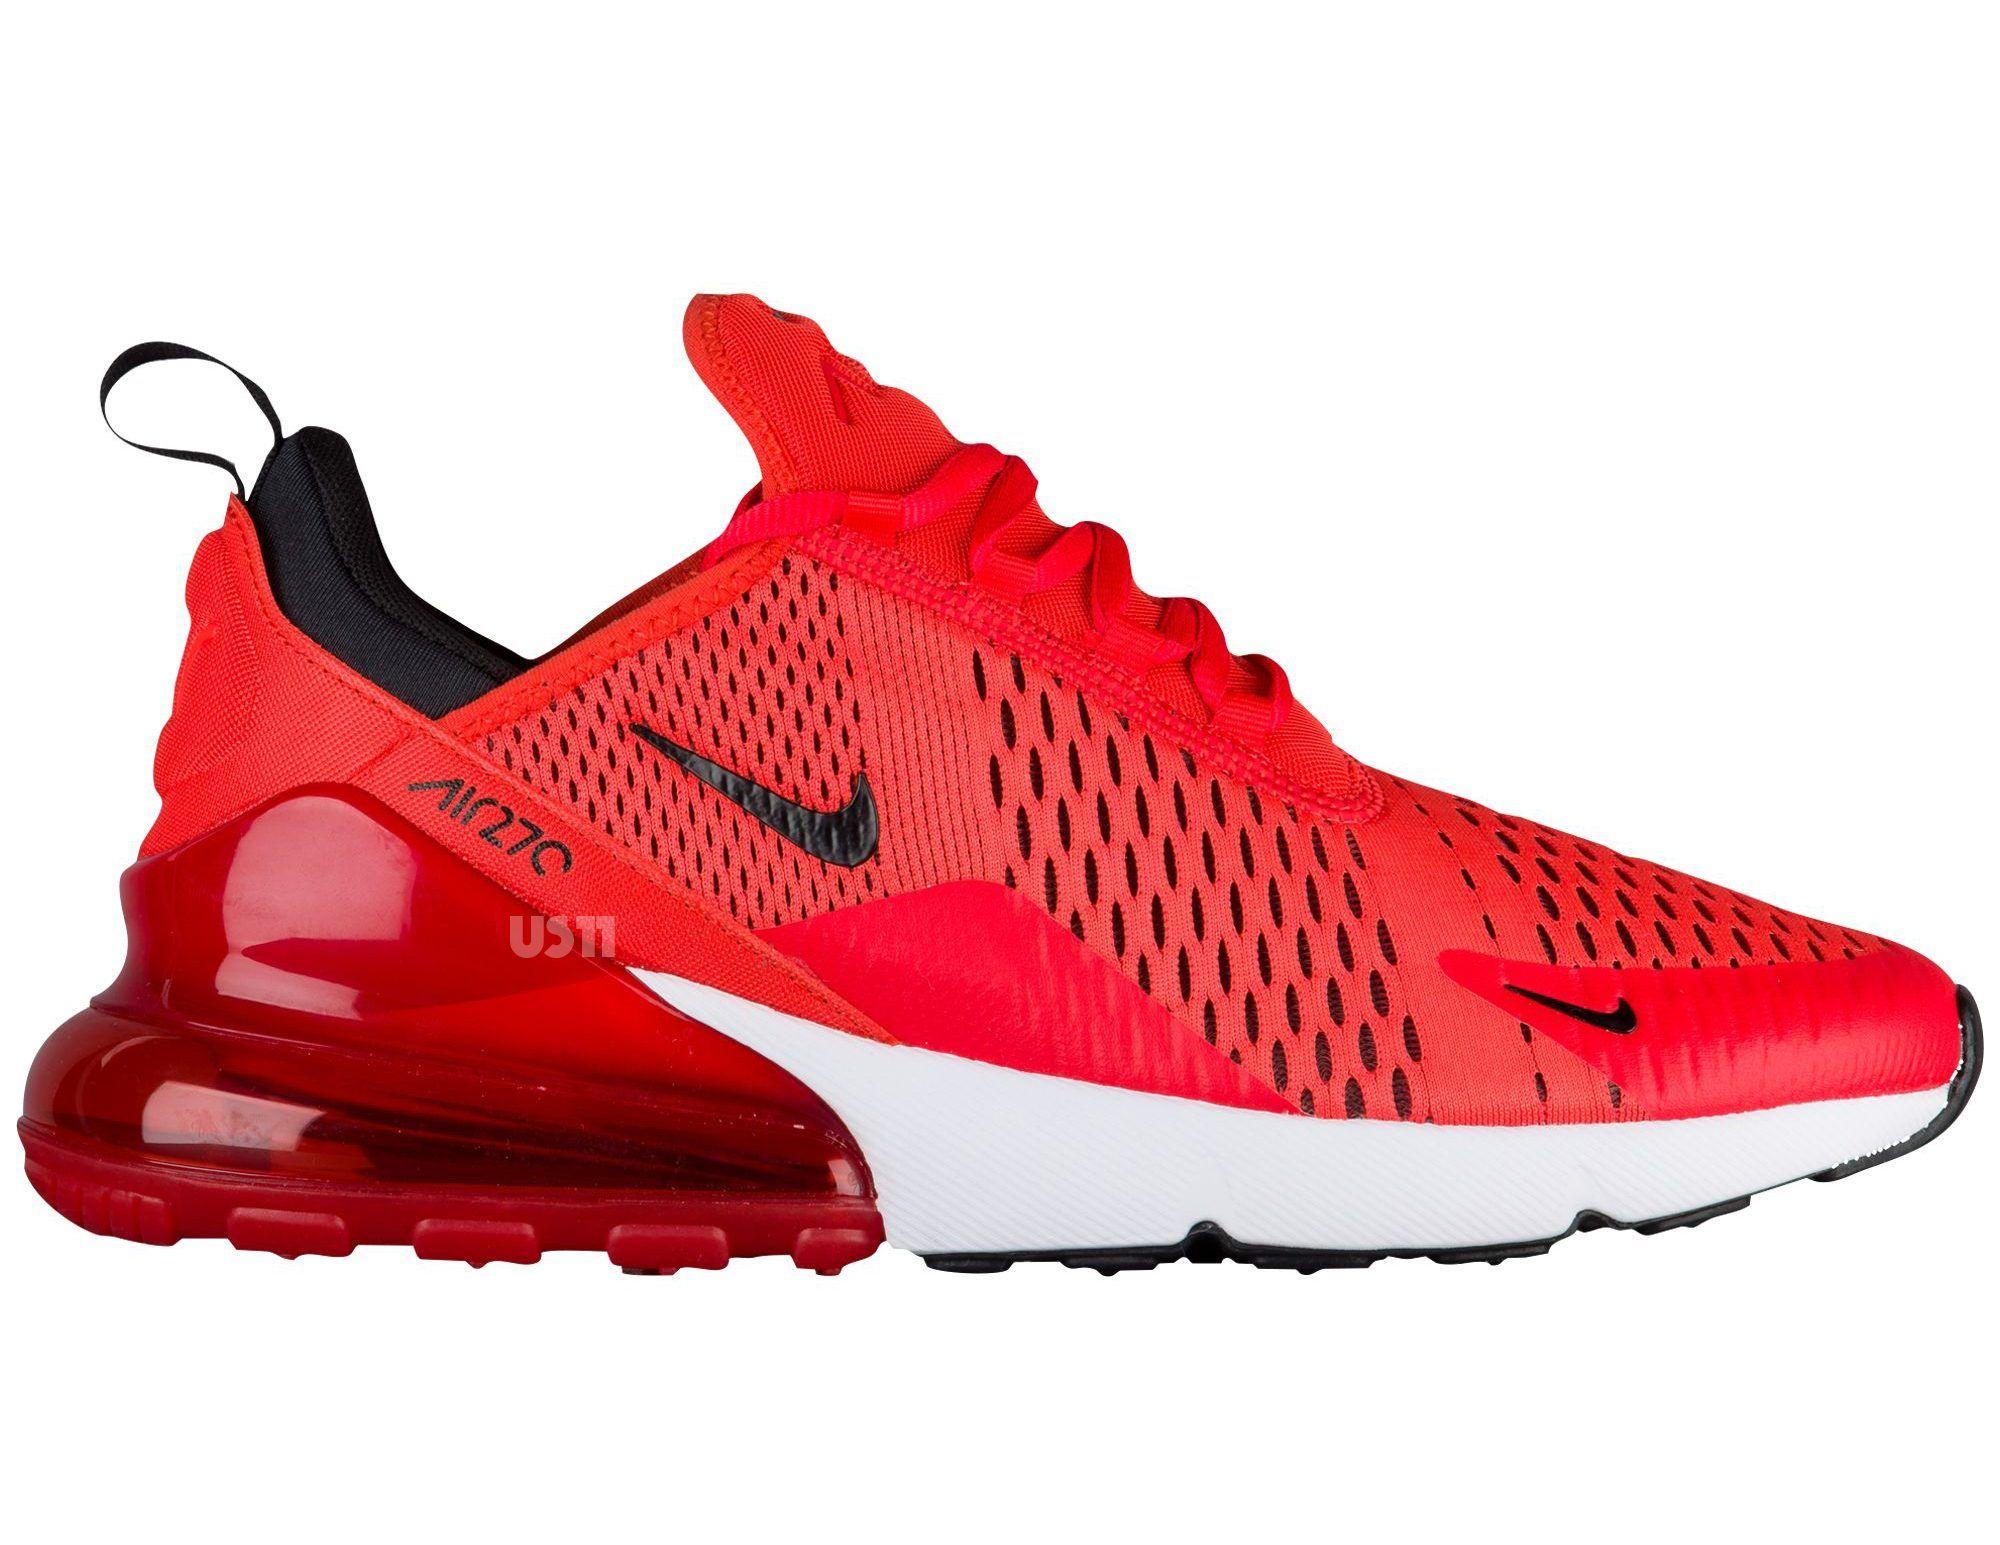 Nike Air 270 Red 1 Red Nike Shoes Nike Air Max Black Nike Shoes